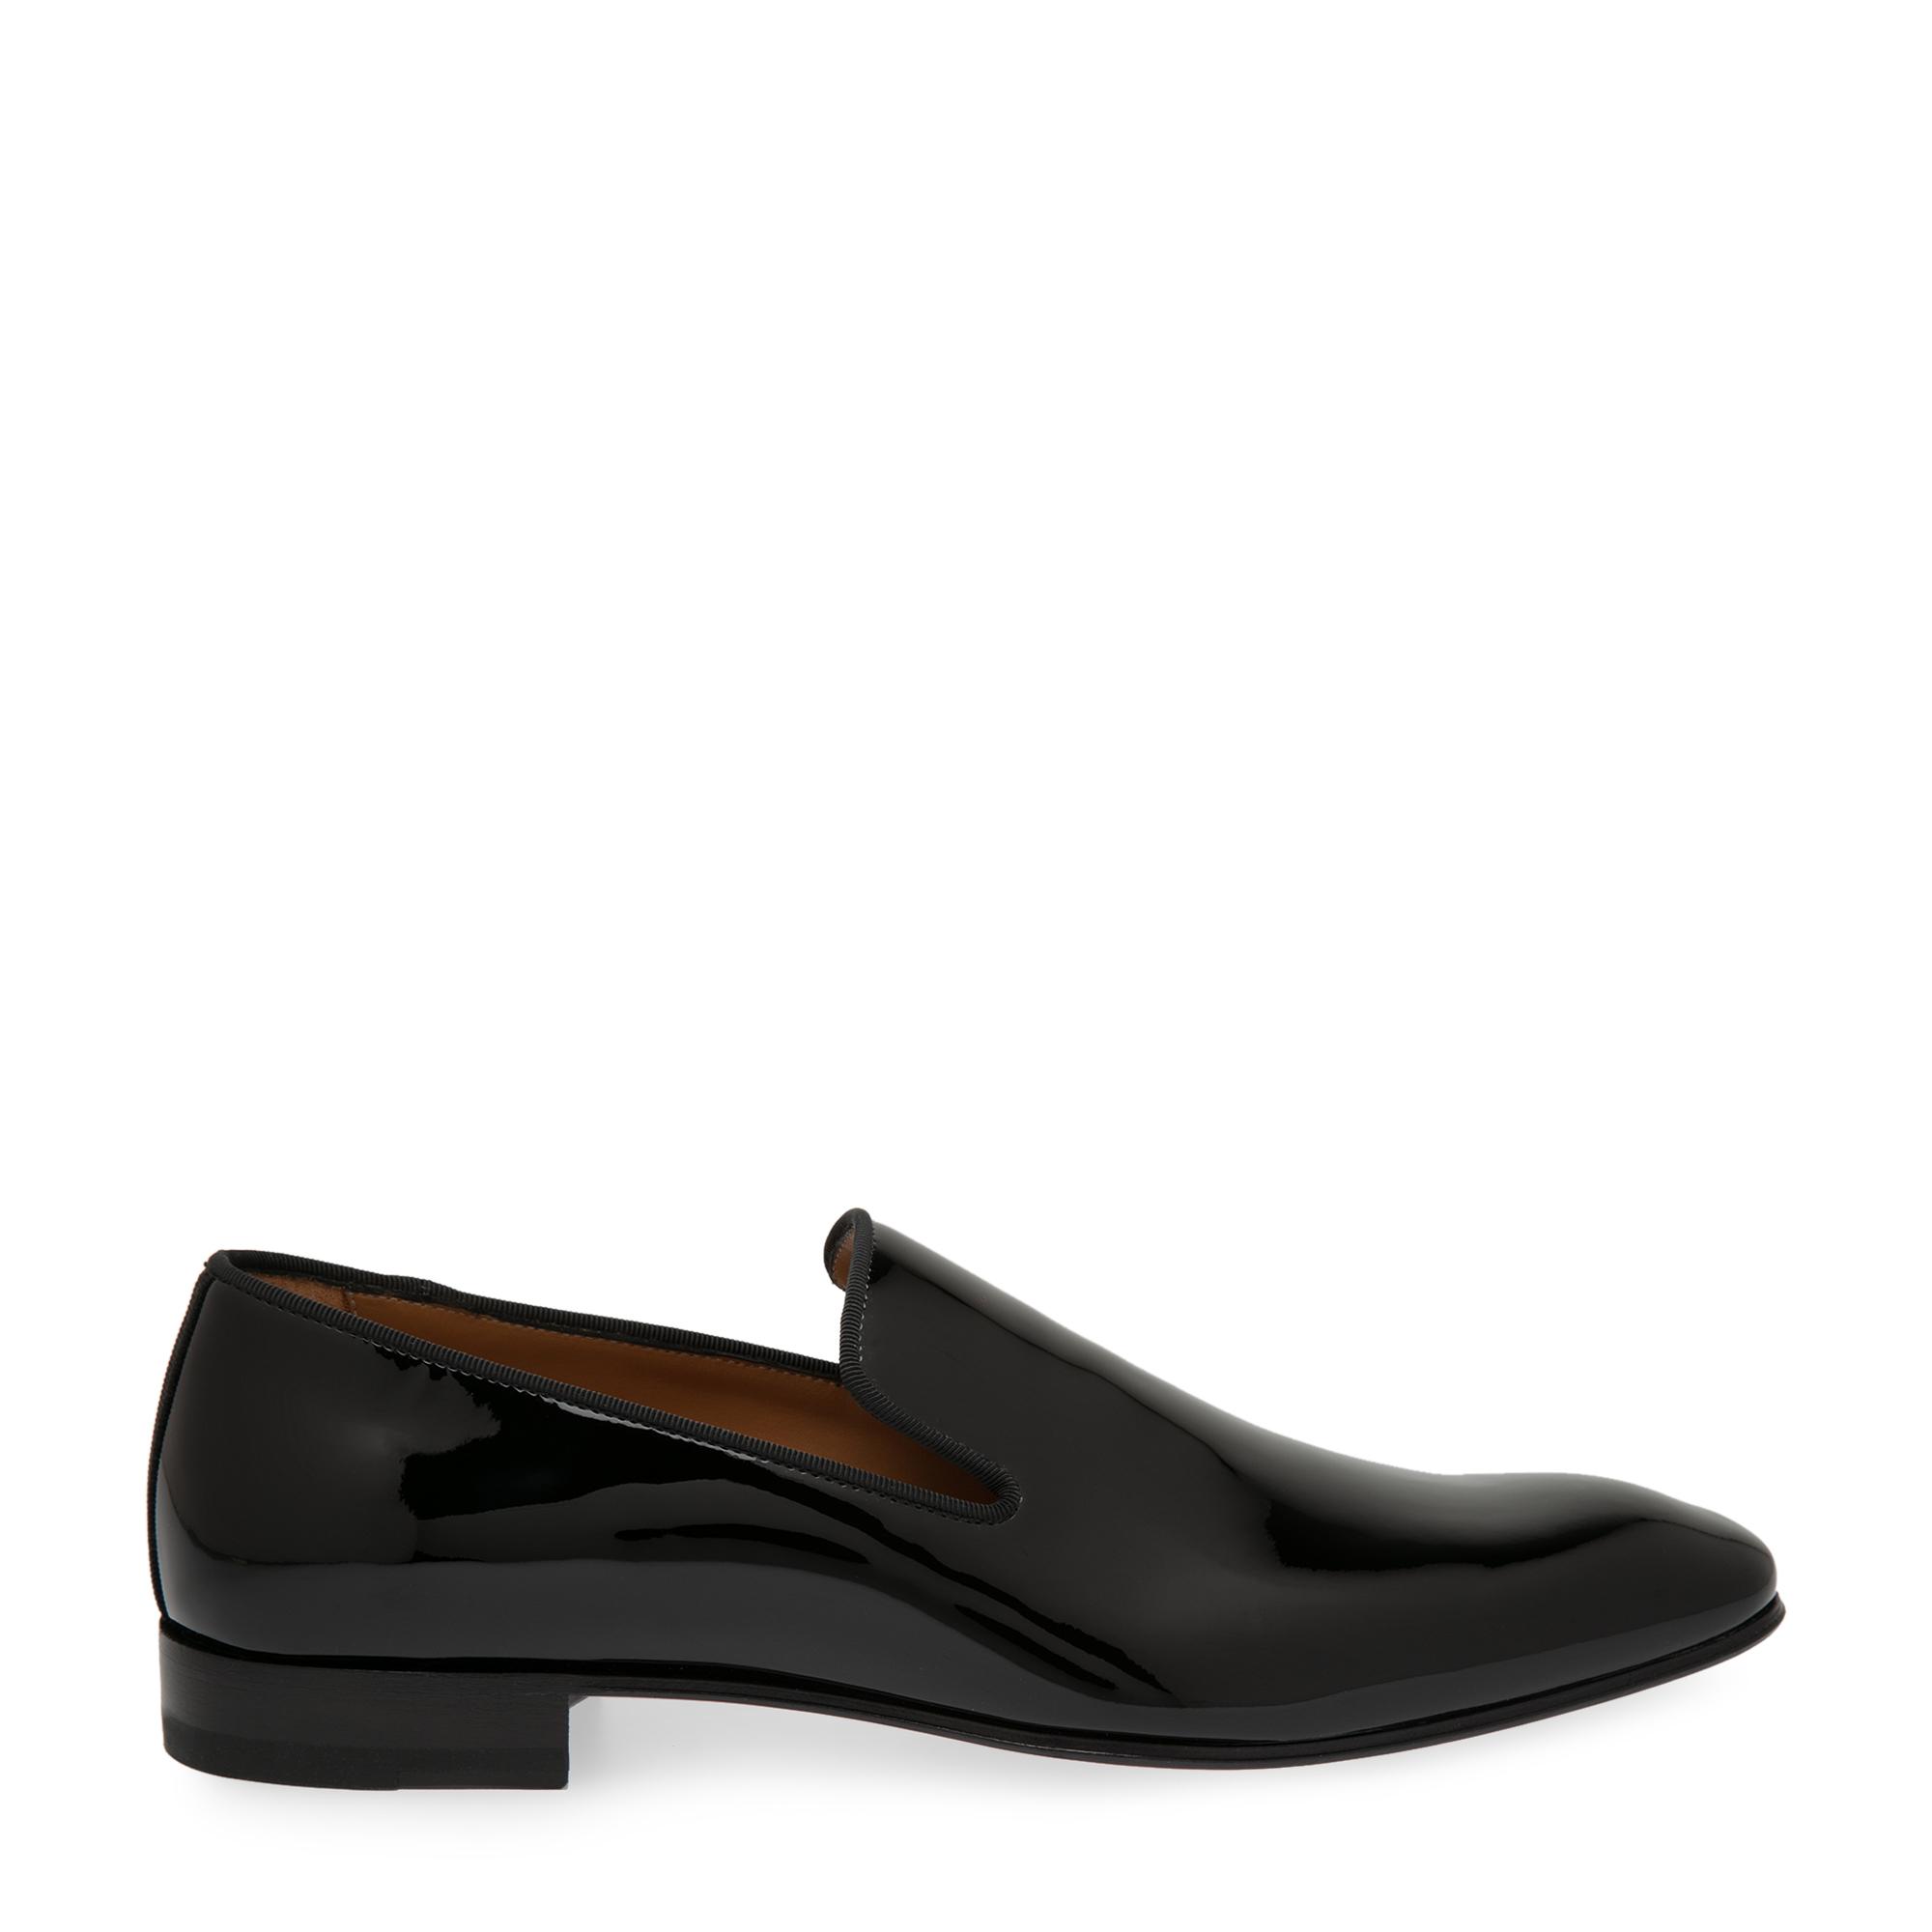 Dandelion loafers